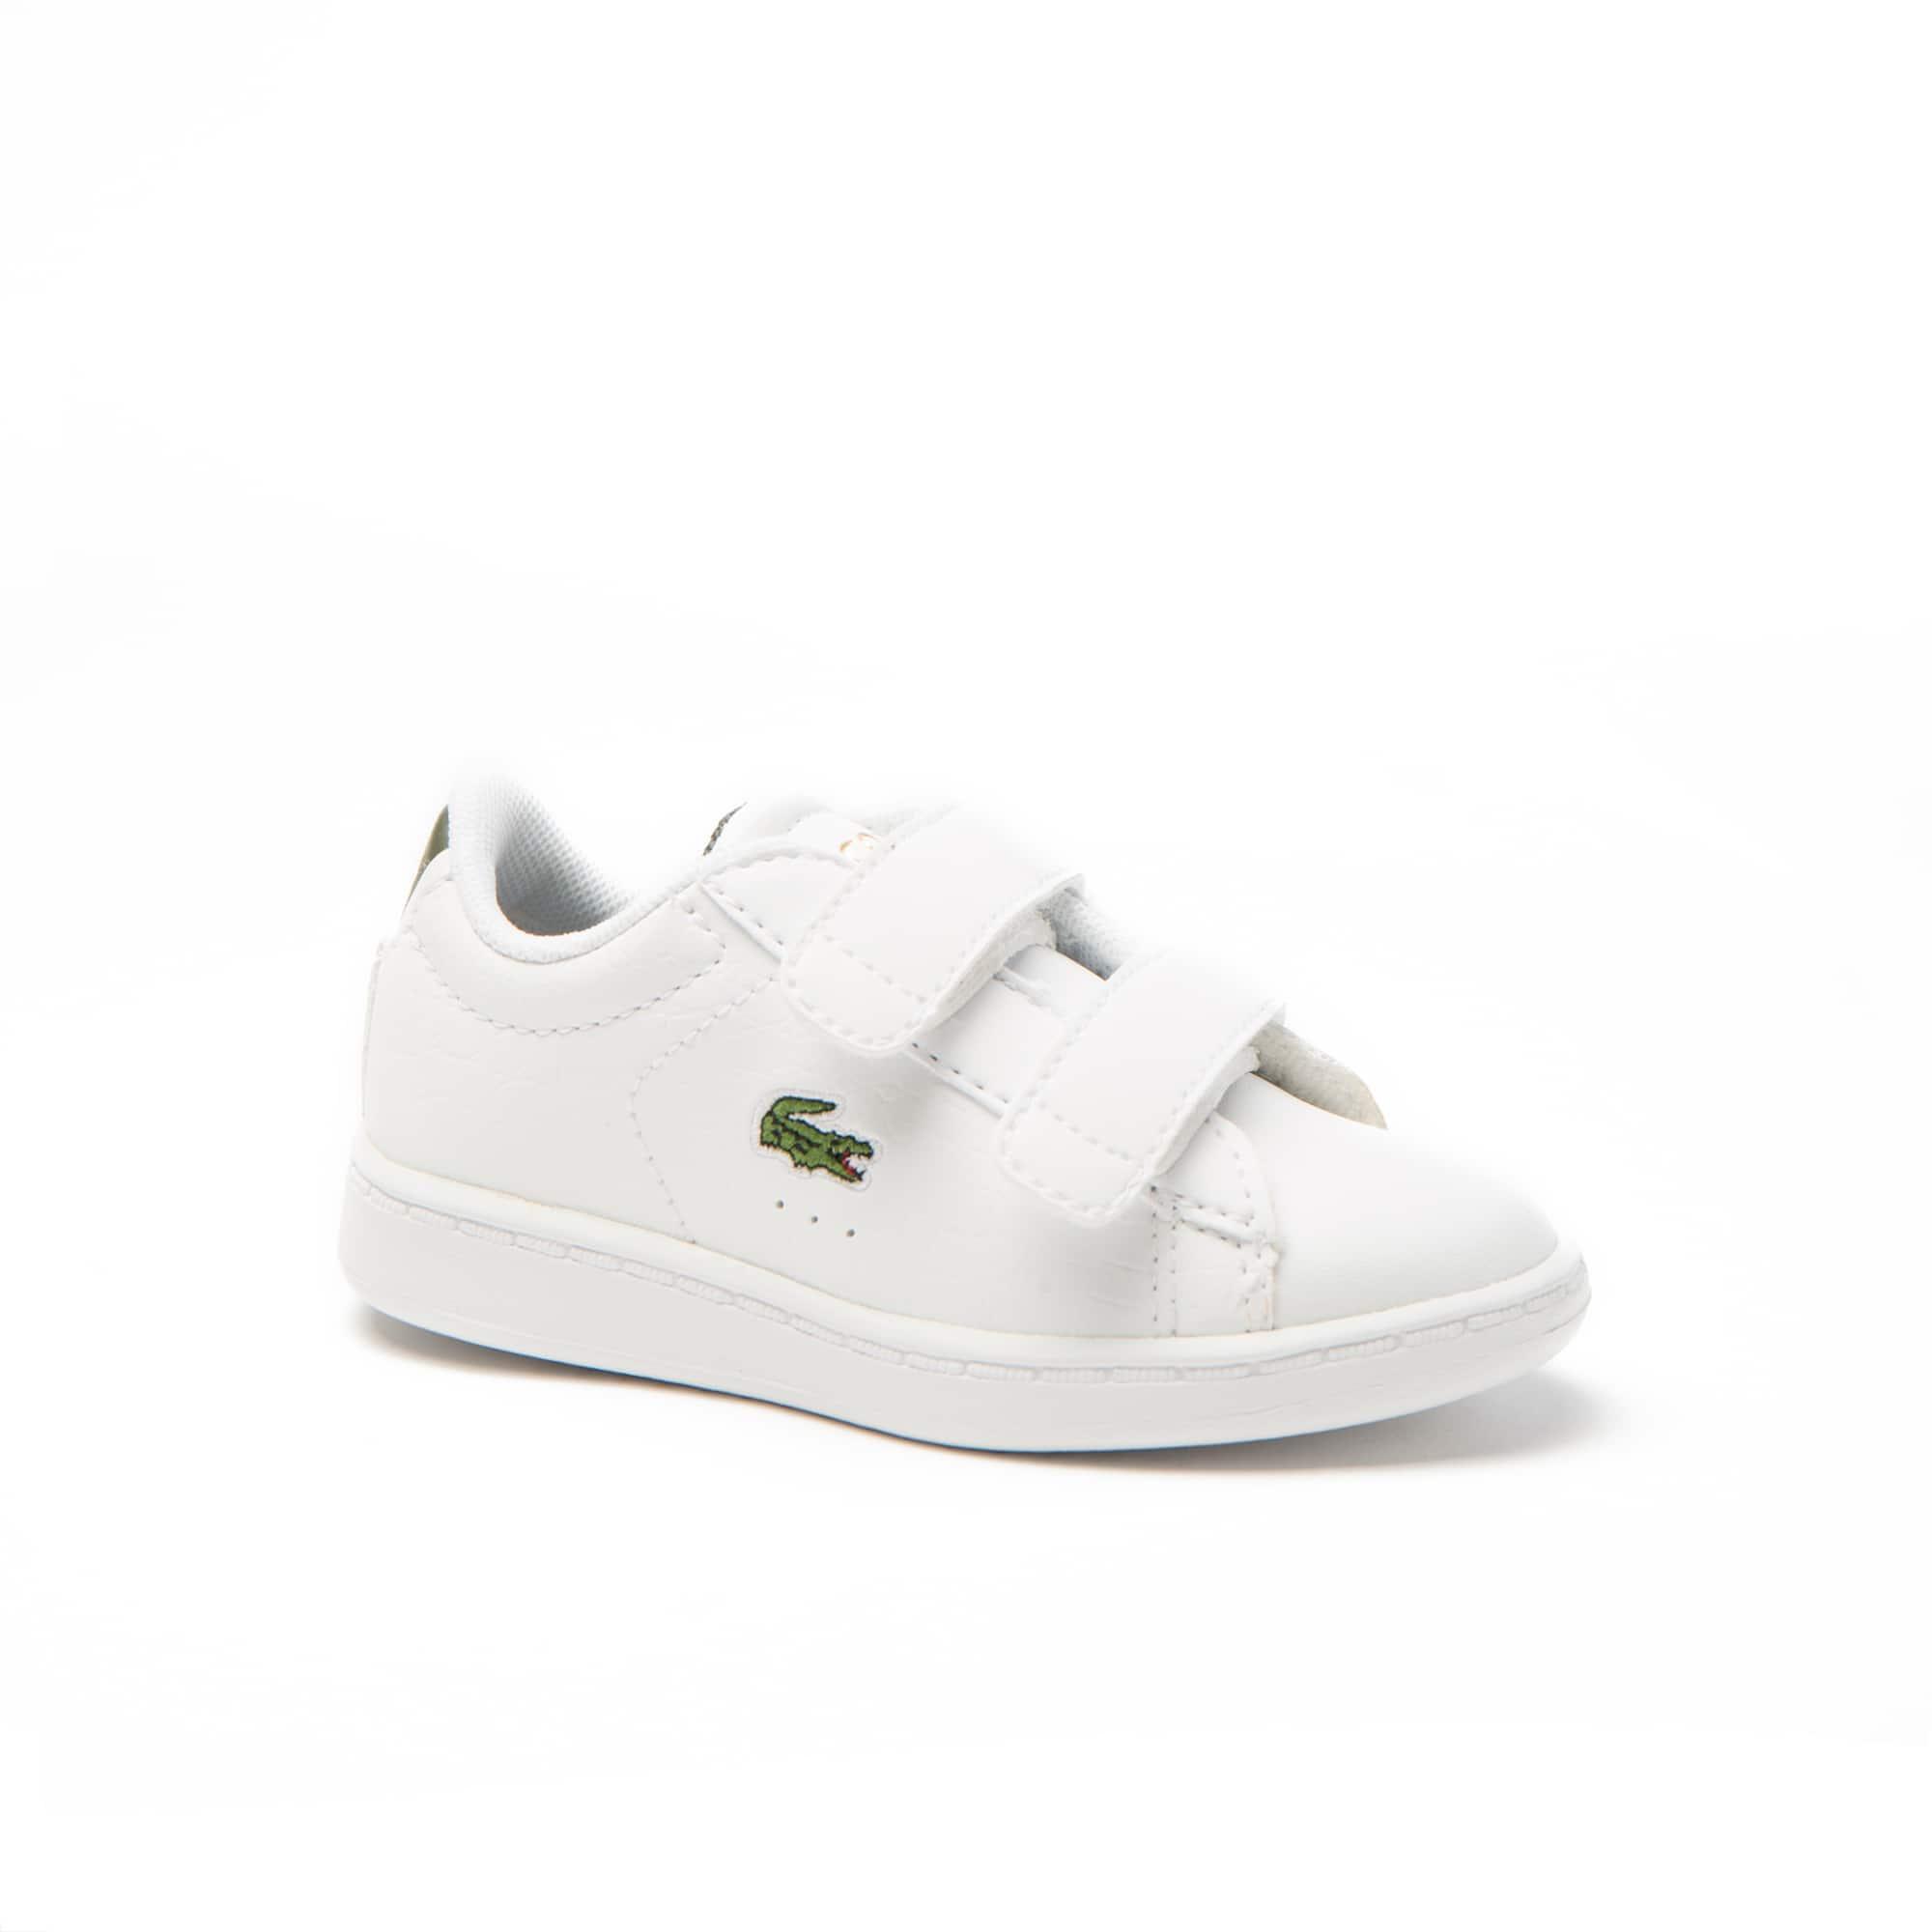 Kids' Carnaby Evo Sneakers